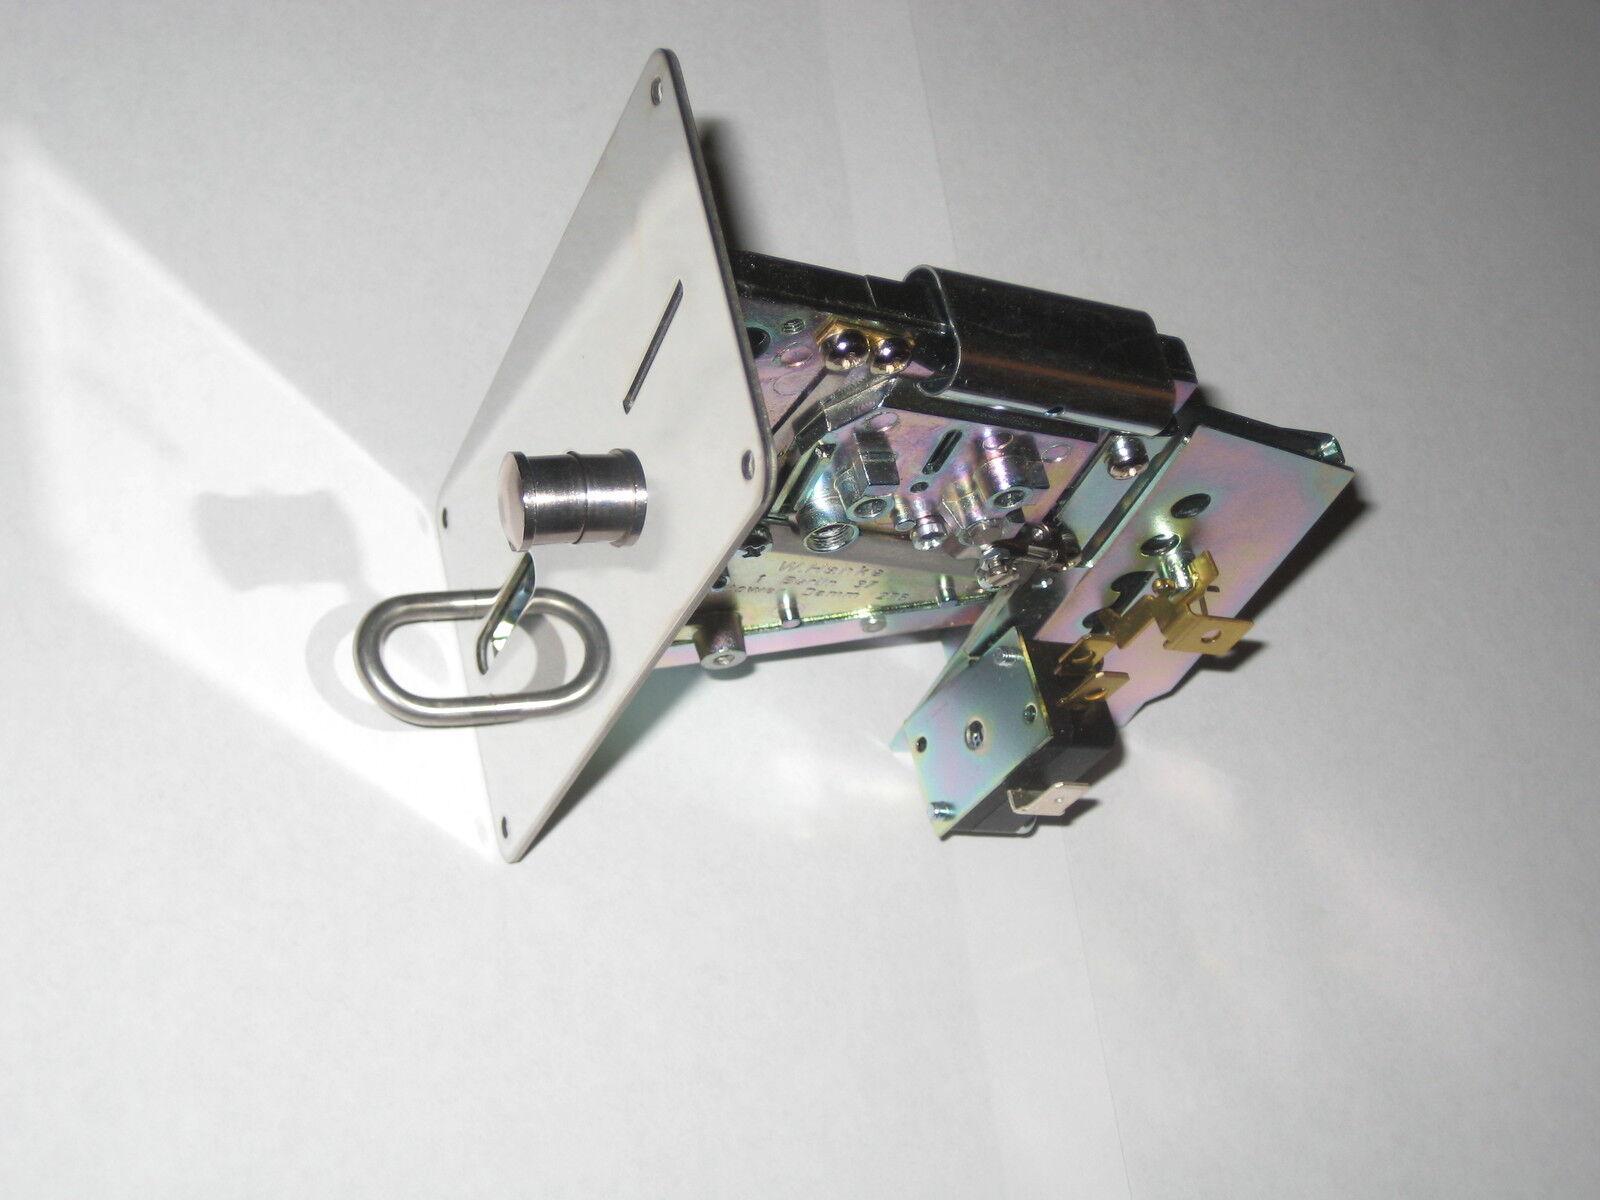 dexter coin drop wiring diagram dexter wiring diagrams photos